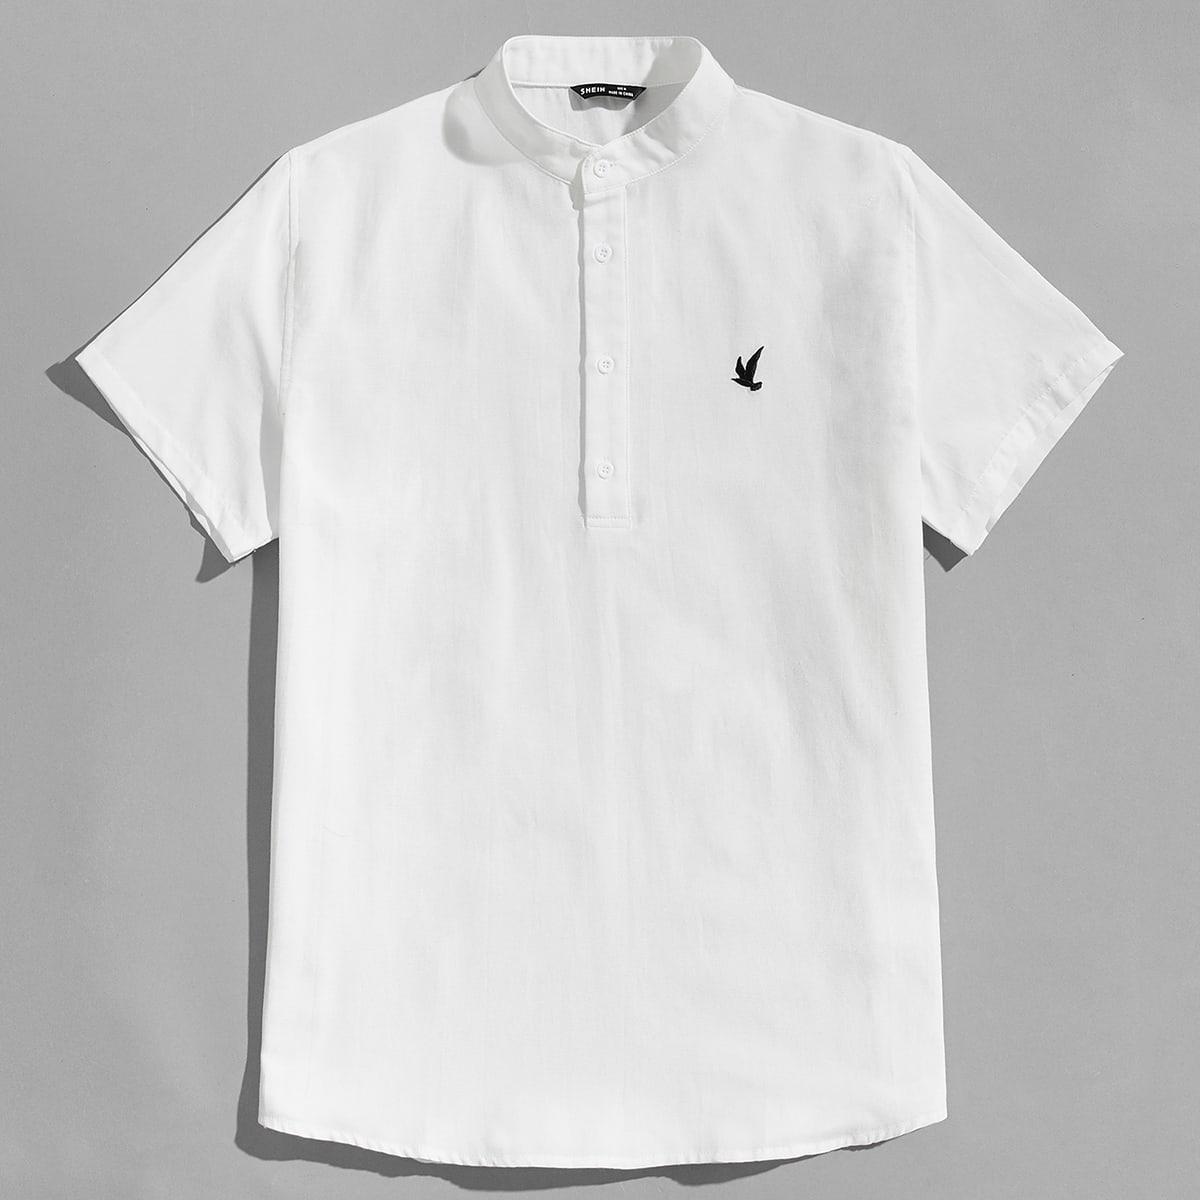 Men Embroidery Bird Half Button Placket Shirt, SHEIN  - buy with discount